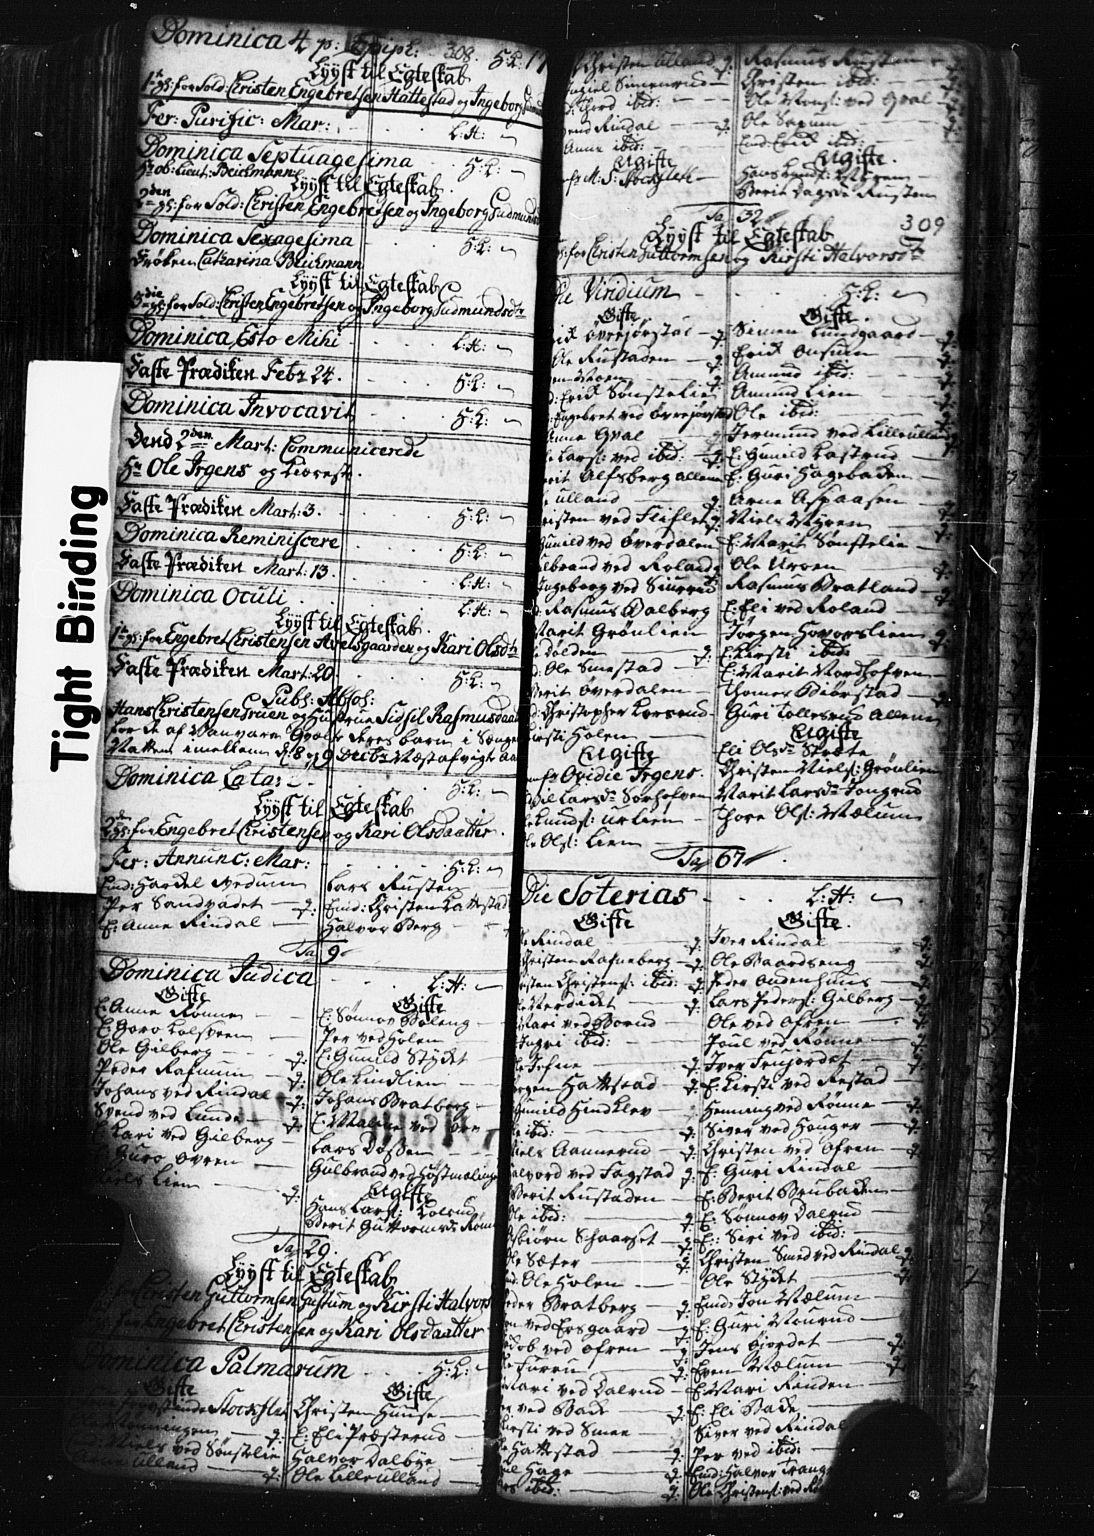 SAH, Fåberg prestekontor, Klokkerbok nr. 1, 1727-1767, s. 308-309